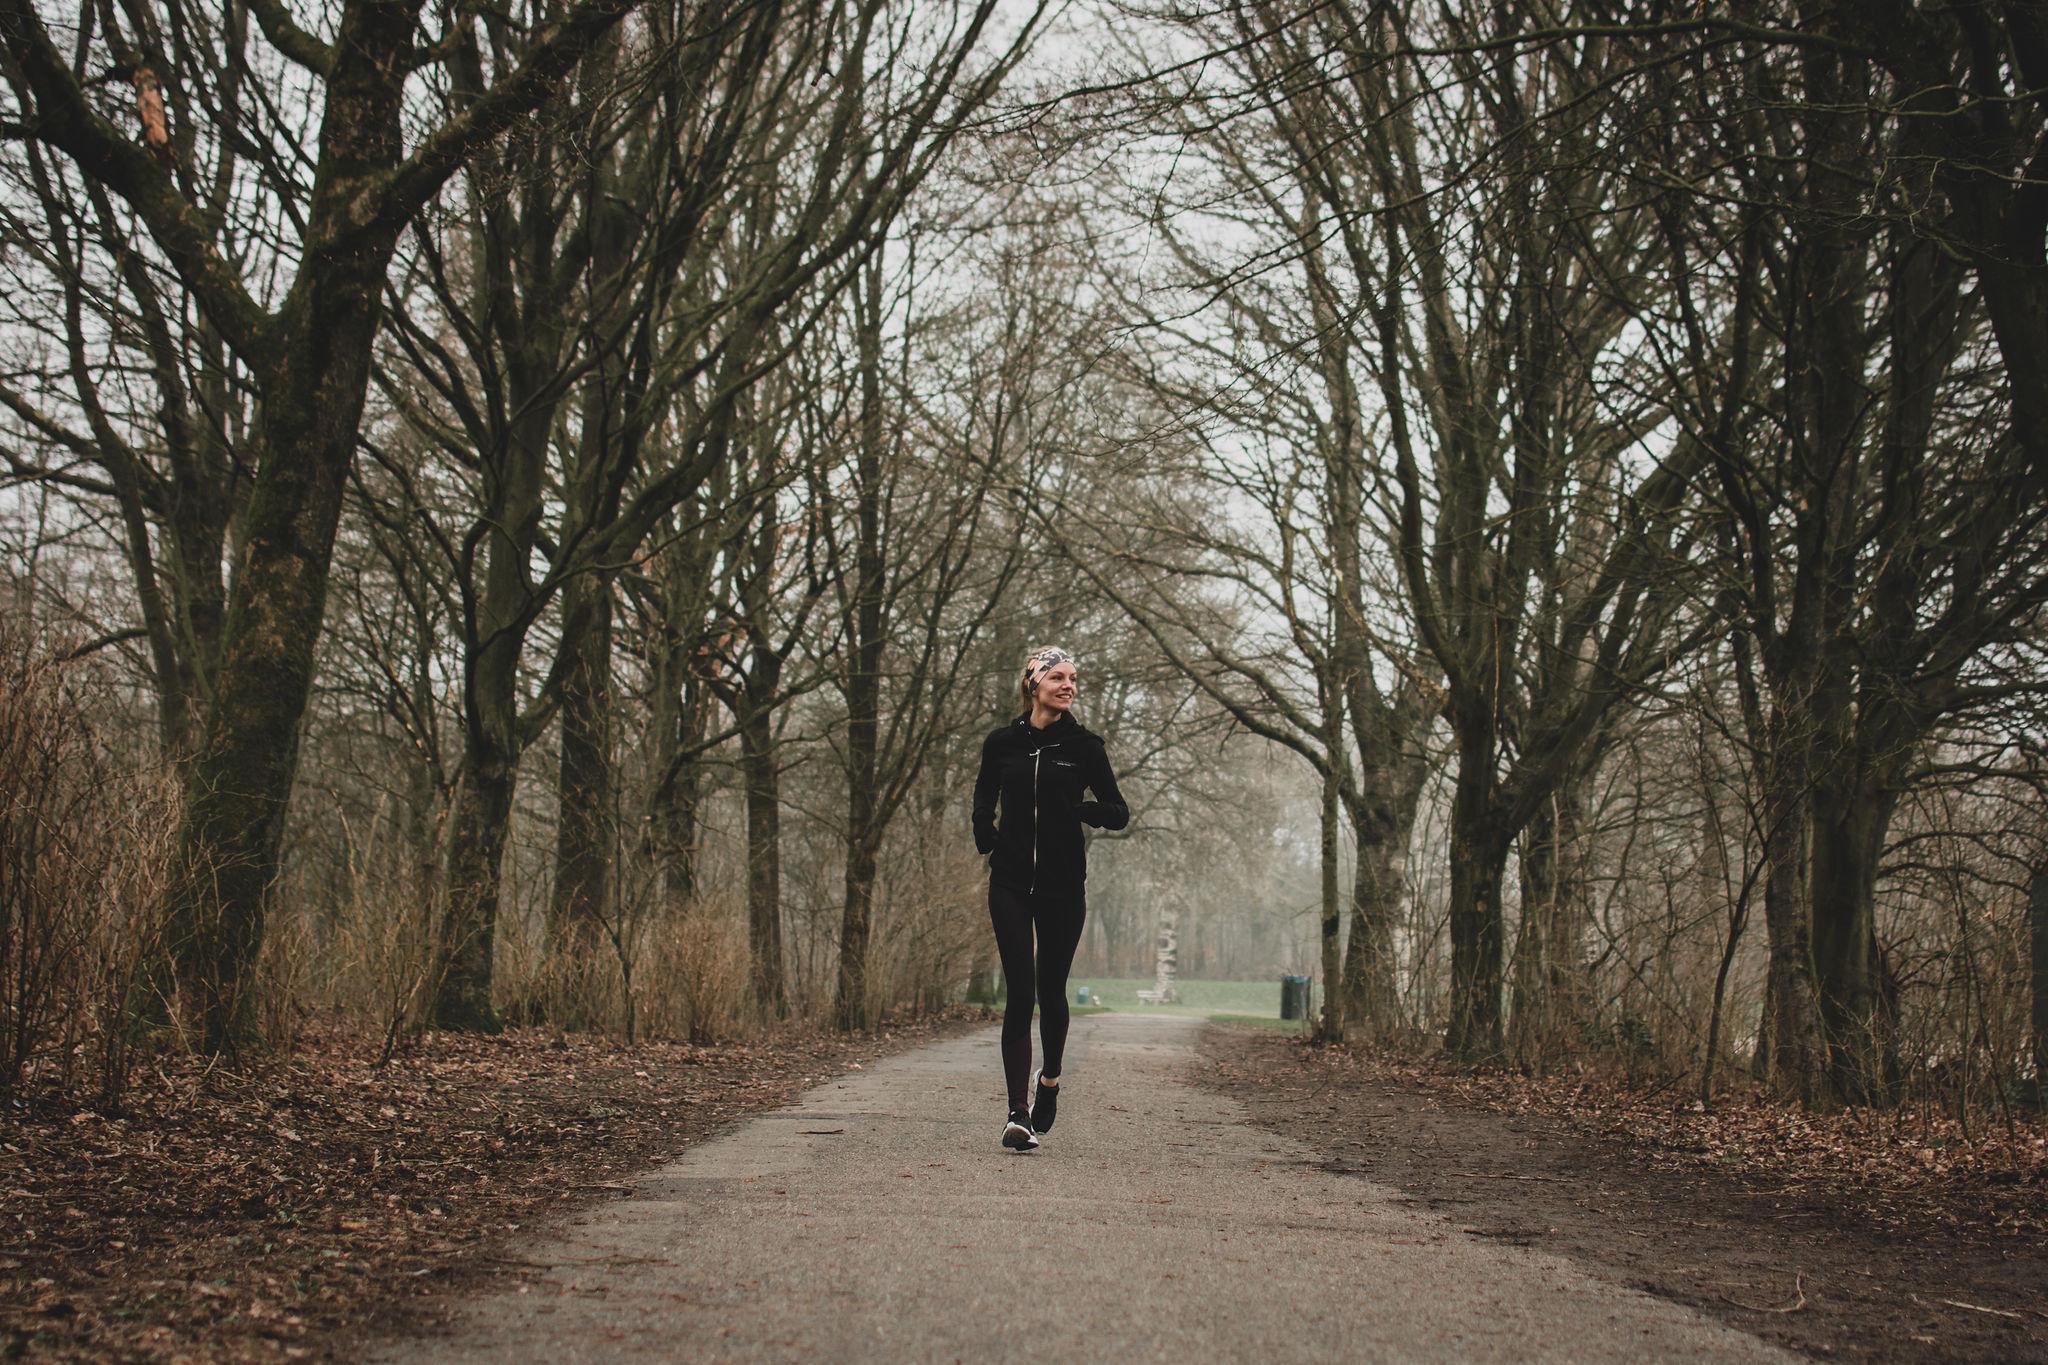 Beginnen met hardlopen groningen 5